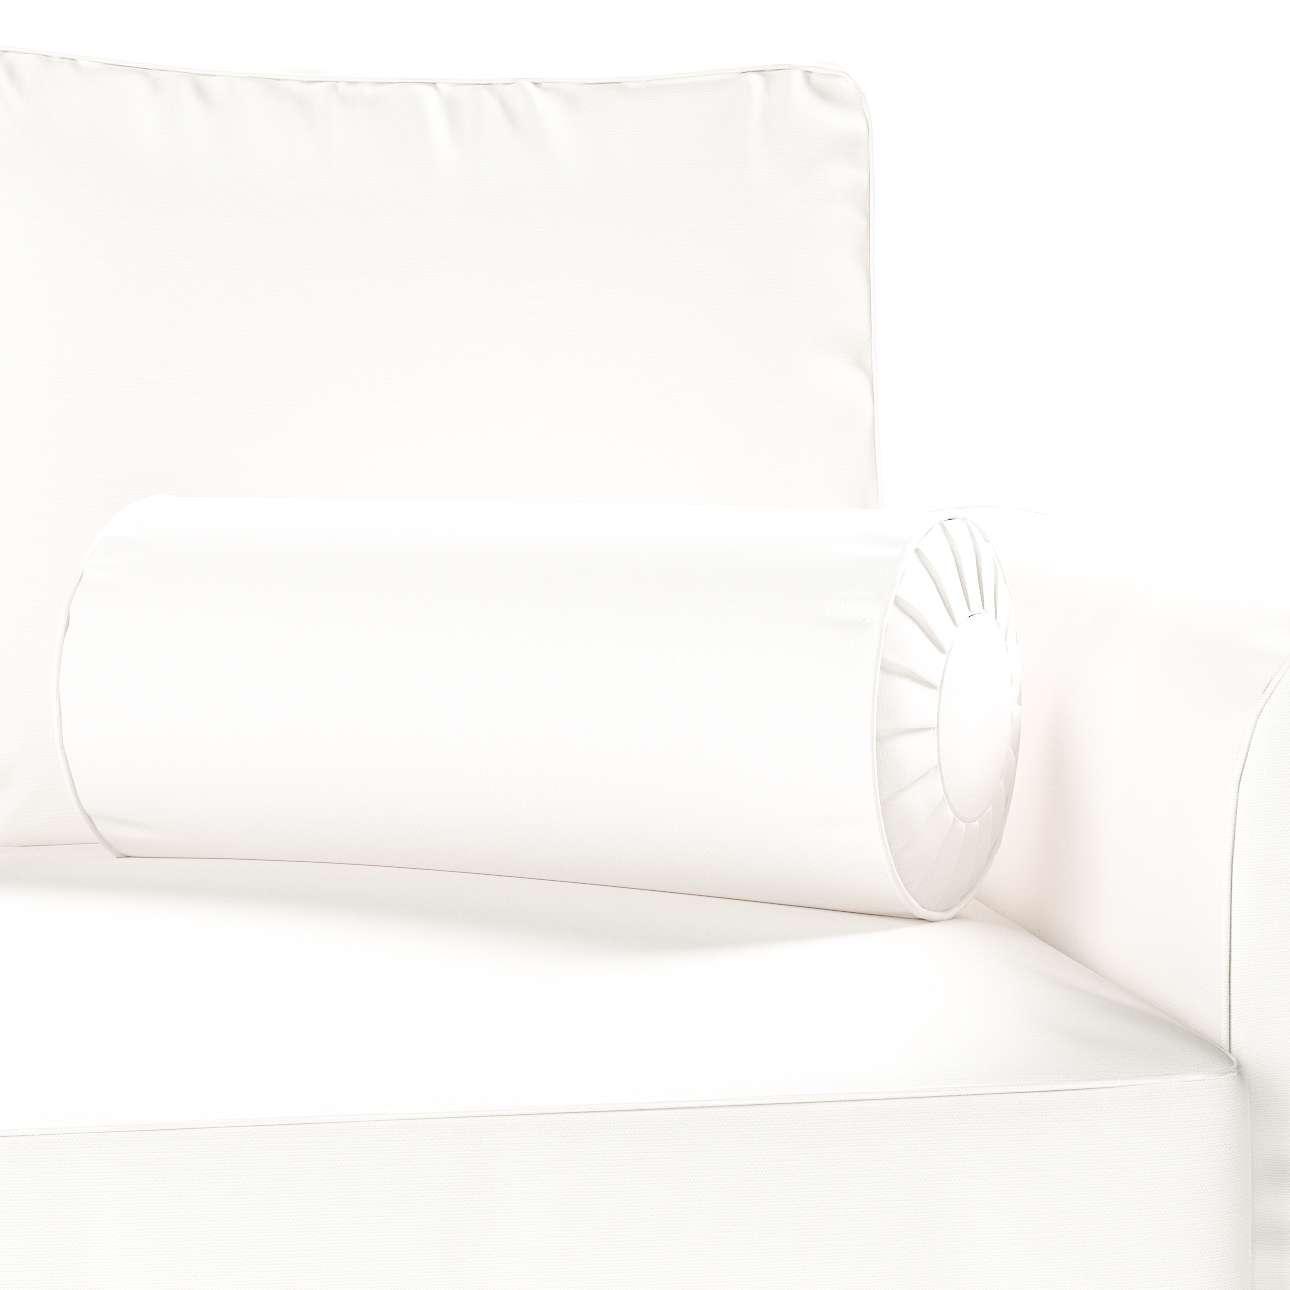 Nakkepude med folder fra kollektionen Cotton Panama, Stof: 702-34